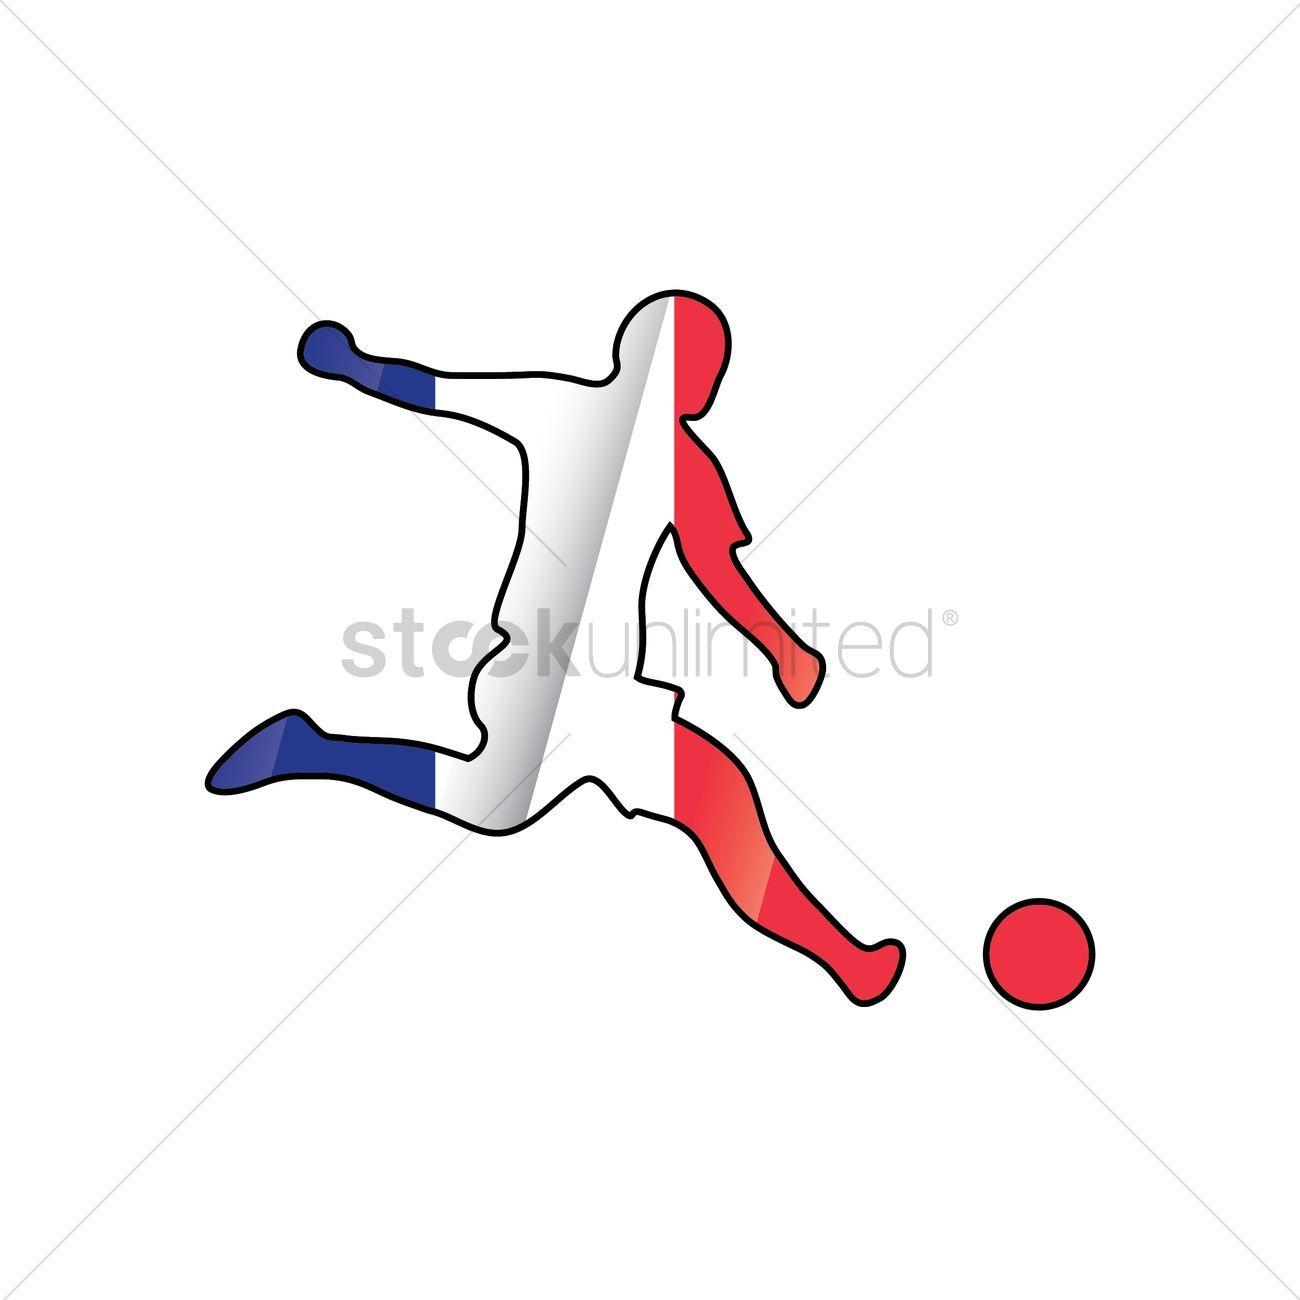 Soccer Player Dribbling Ball Vectors Stock Clipart Ad Dribbling Player Soccer Ball Clipart Affiliate Digital Illustration Graphic Character